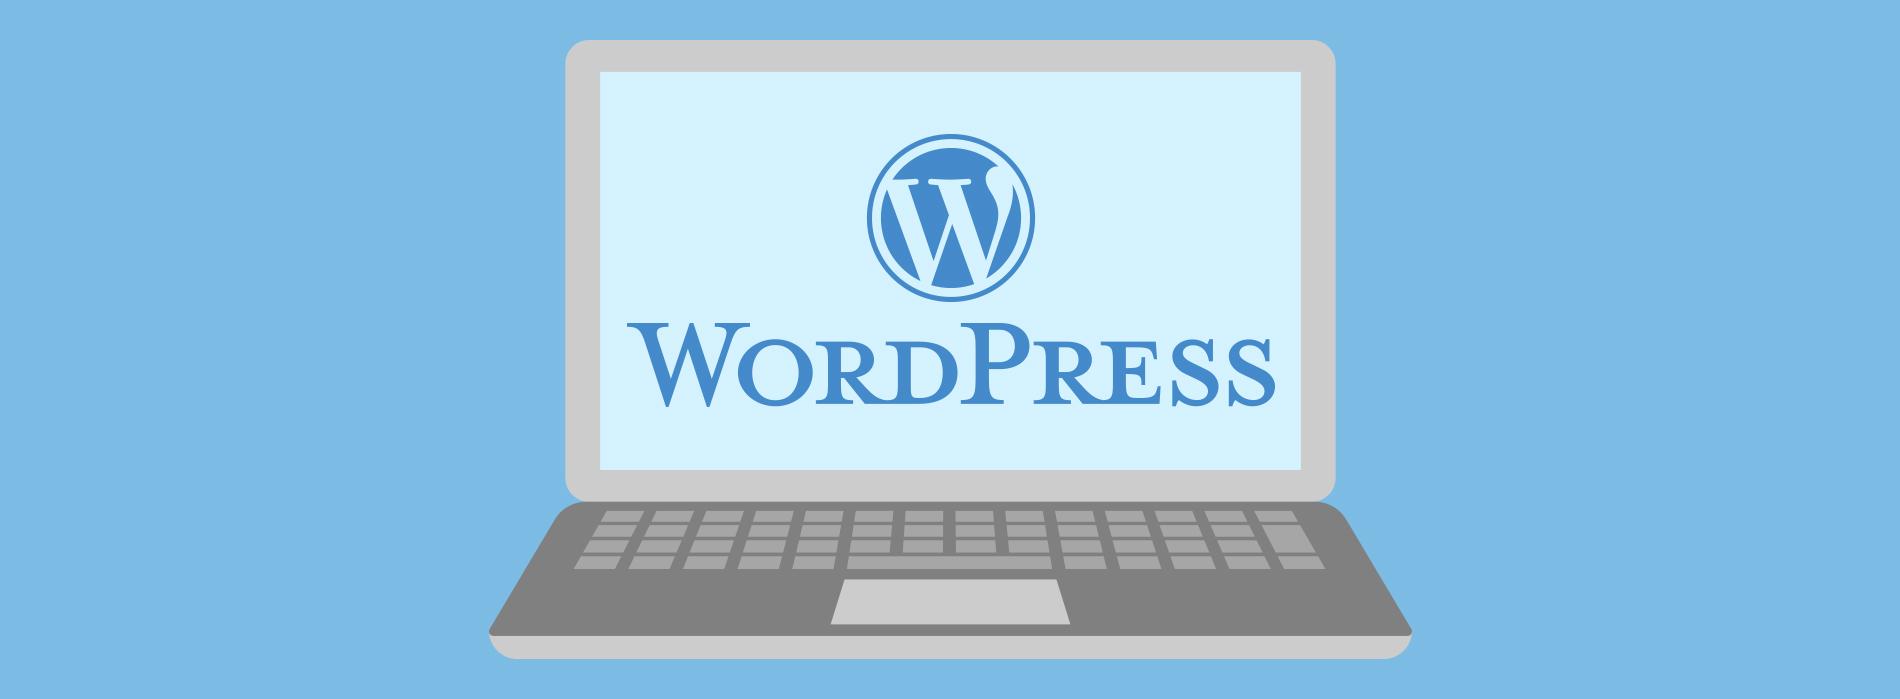 WordPressとは…CMS初心者もこれさえ読めば簡単理解!